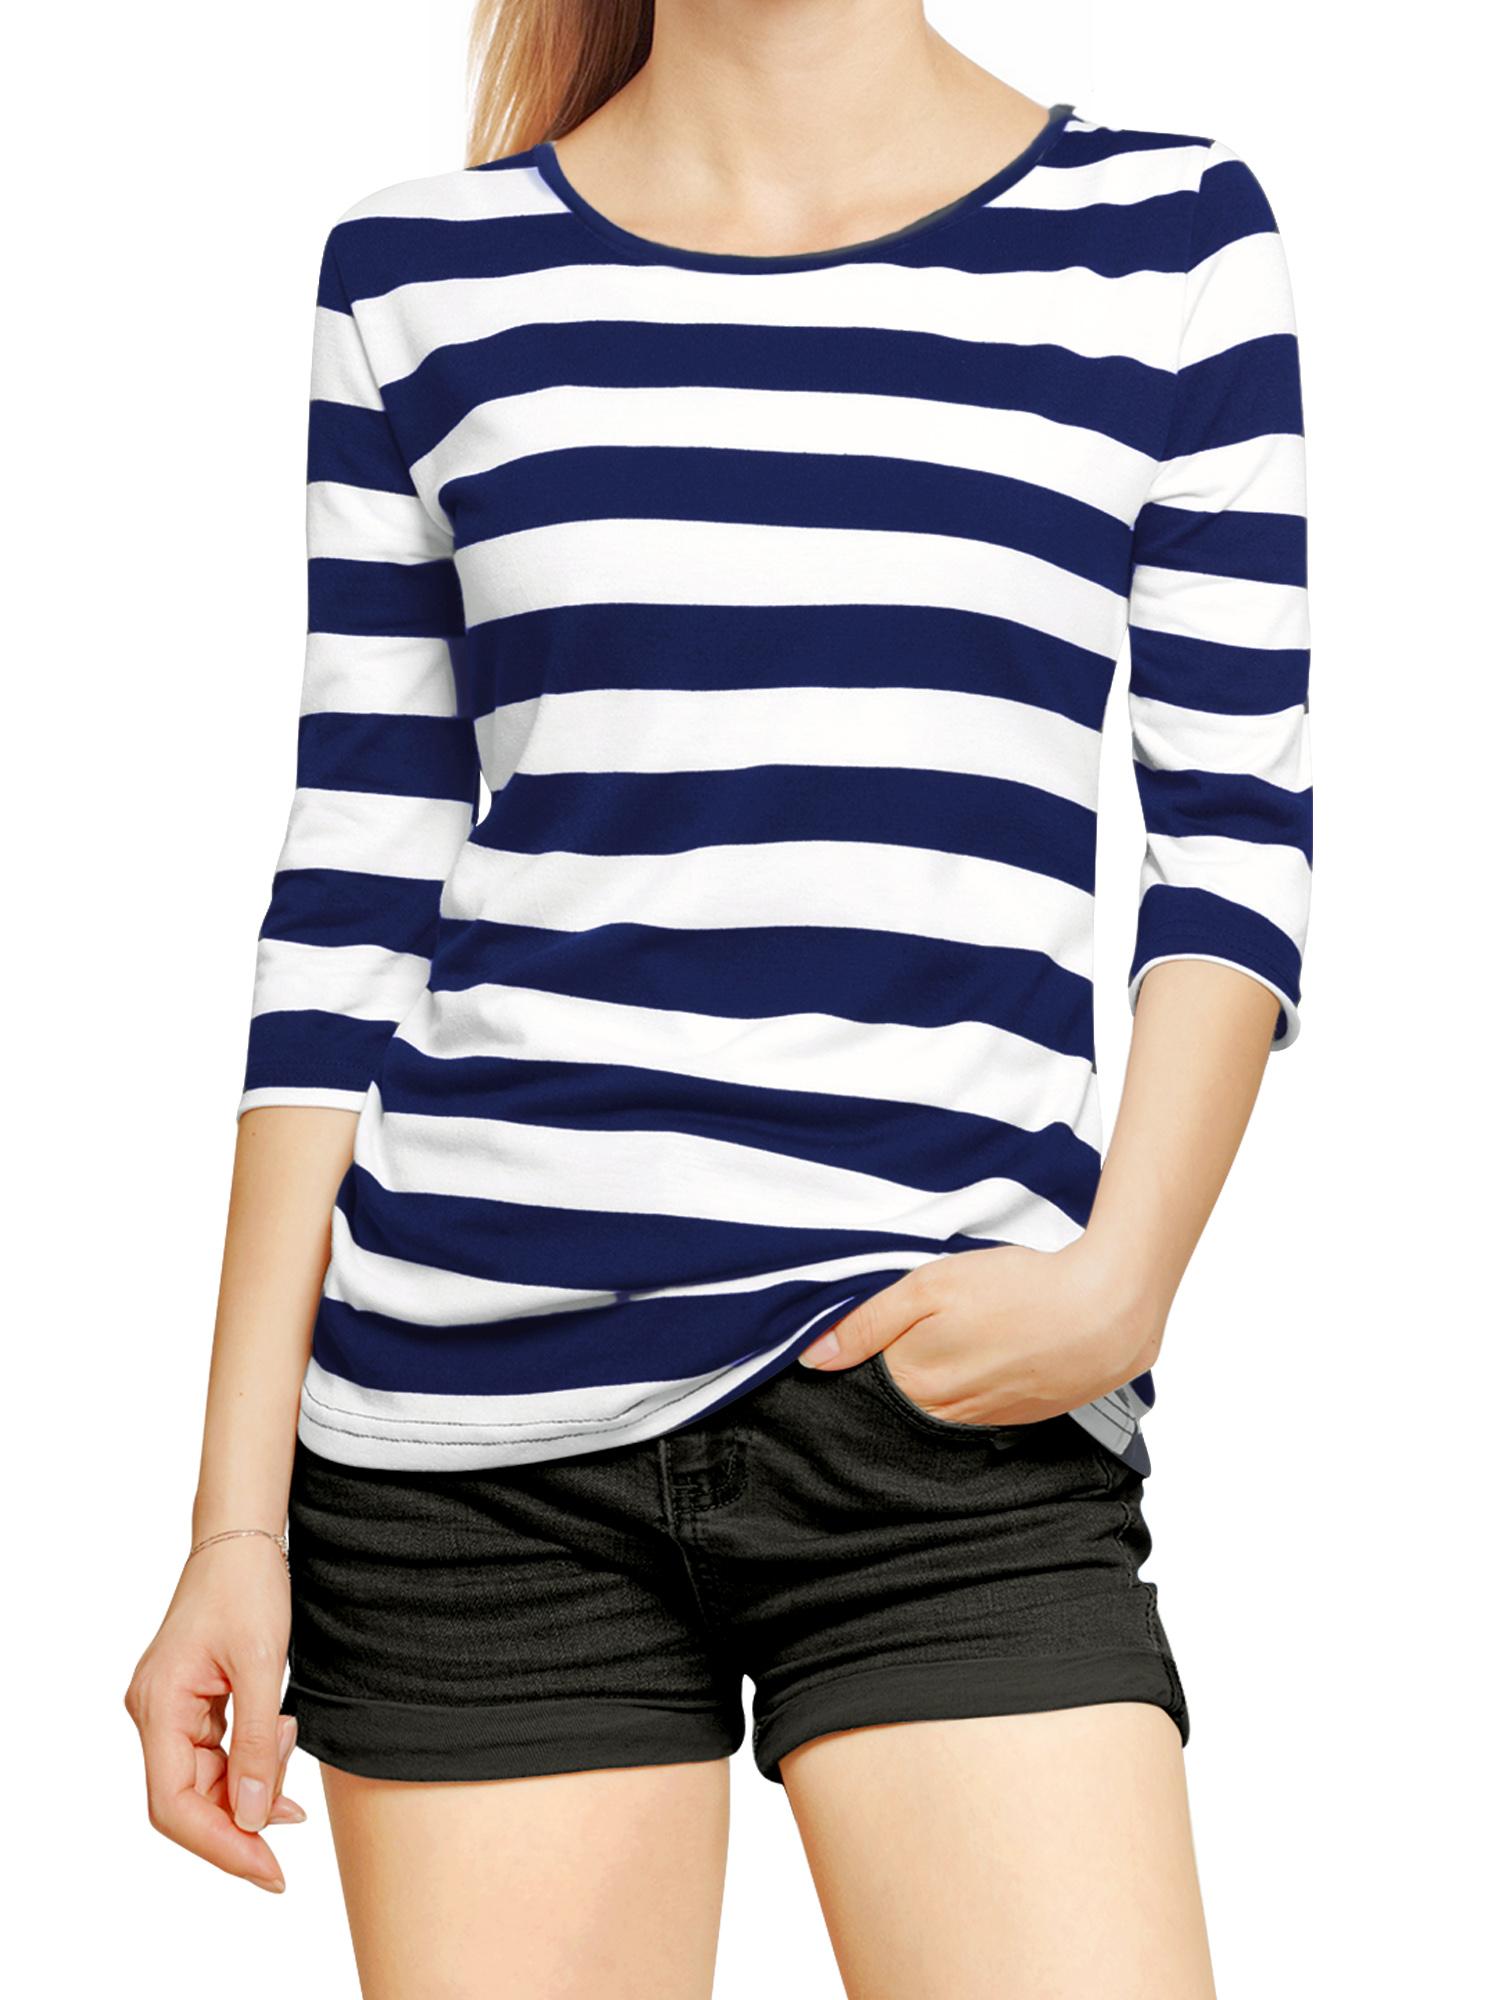 Women Elbow Sleeves Boat Neck Rugby Stripe Tee Dark Blue White L